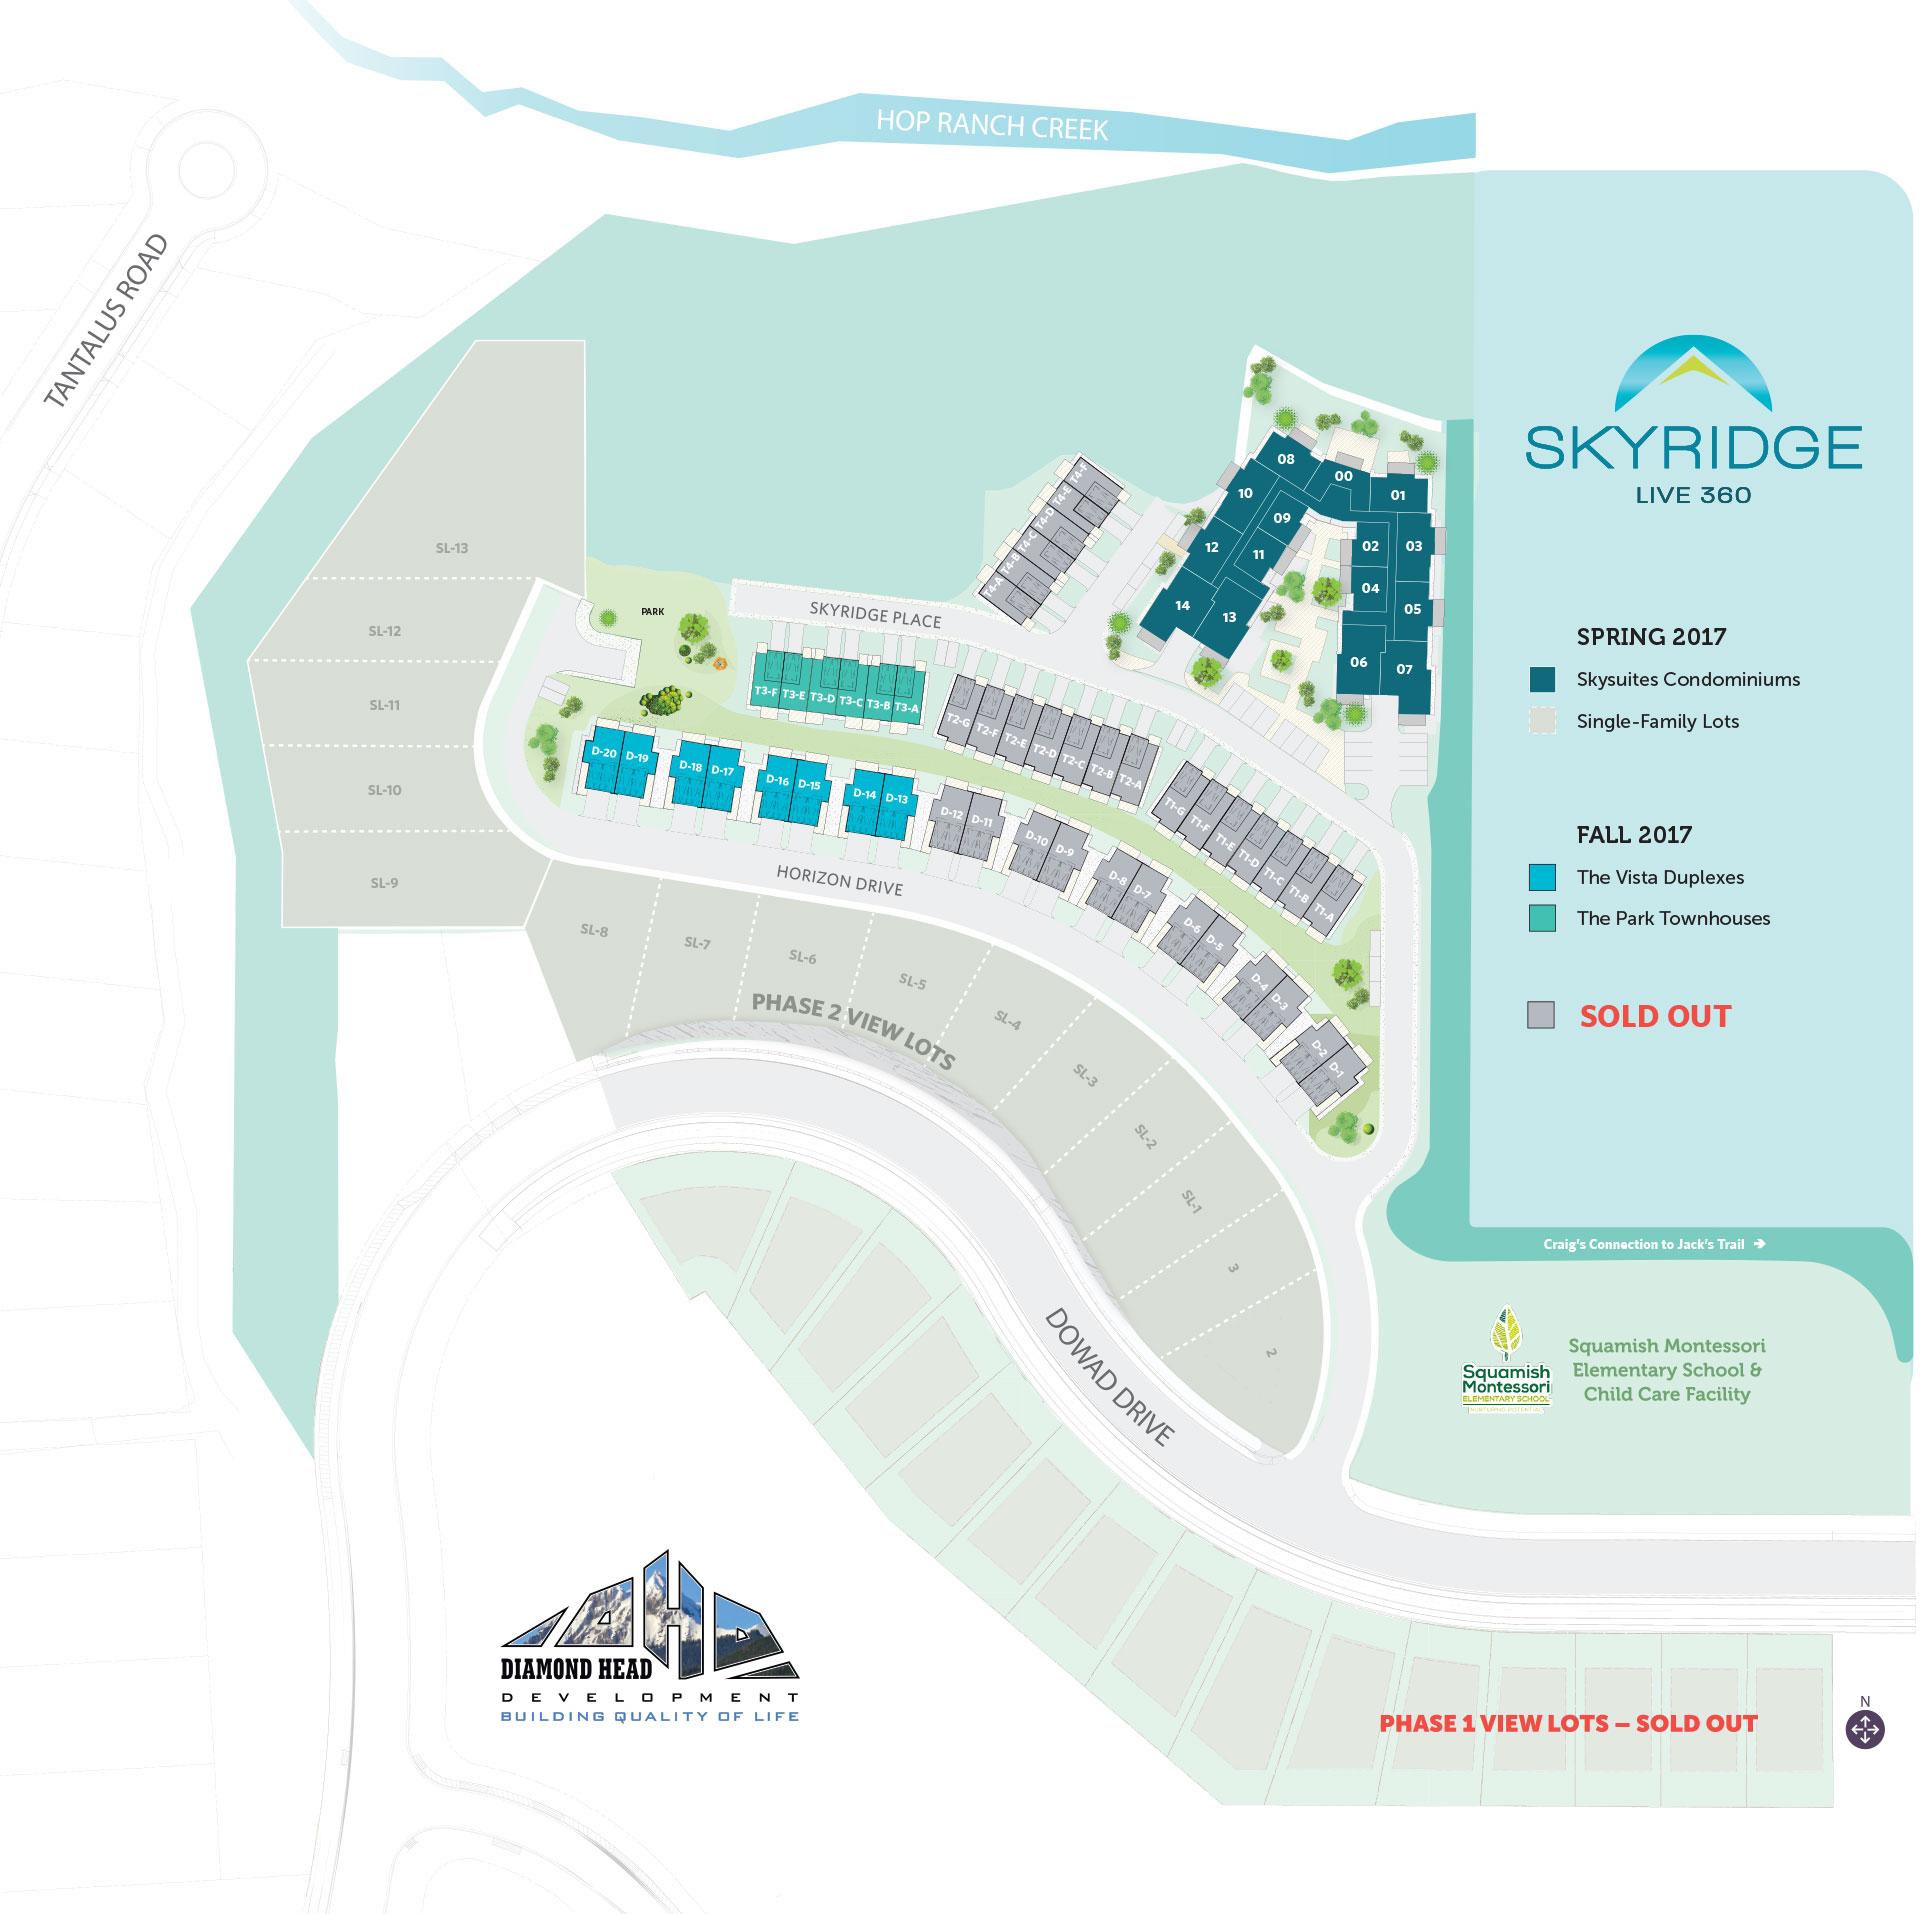 Skyridge Site Plan